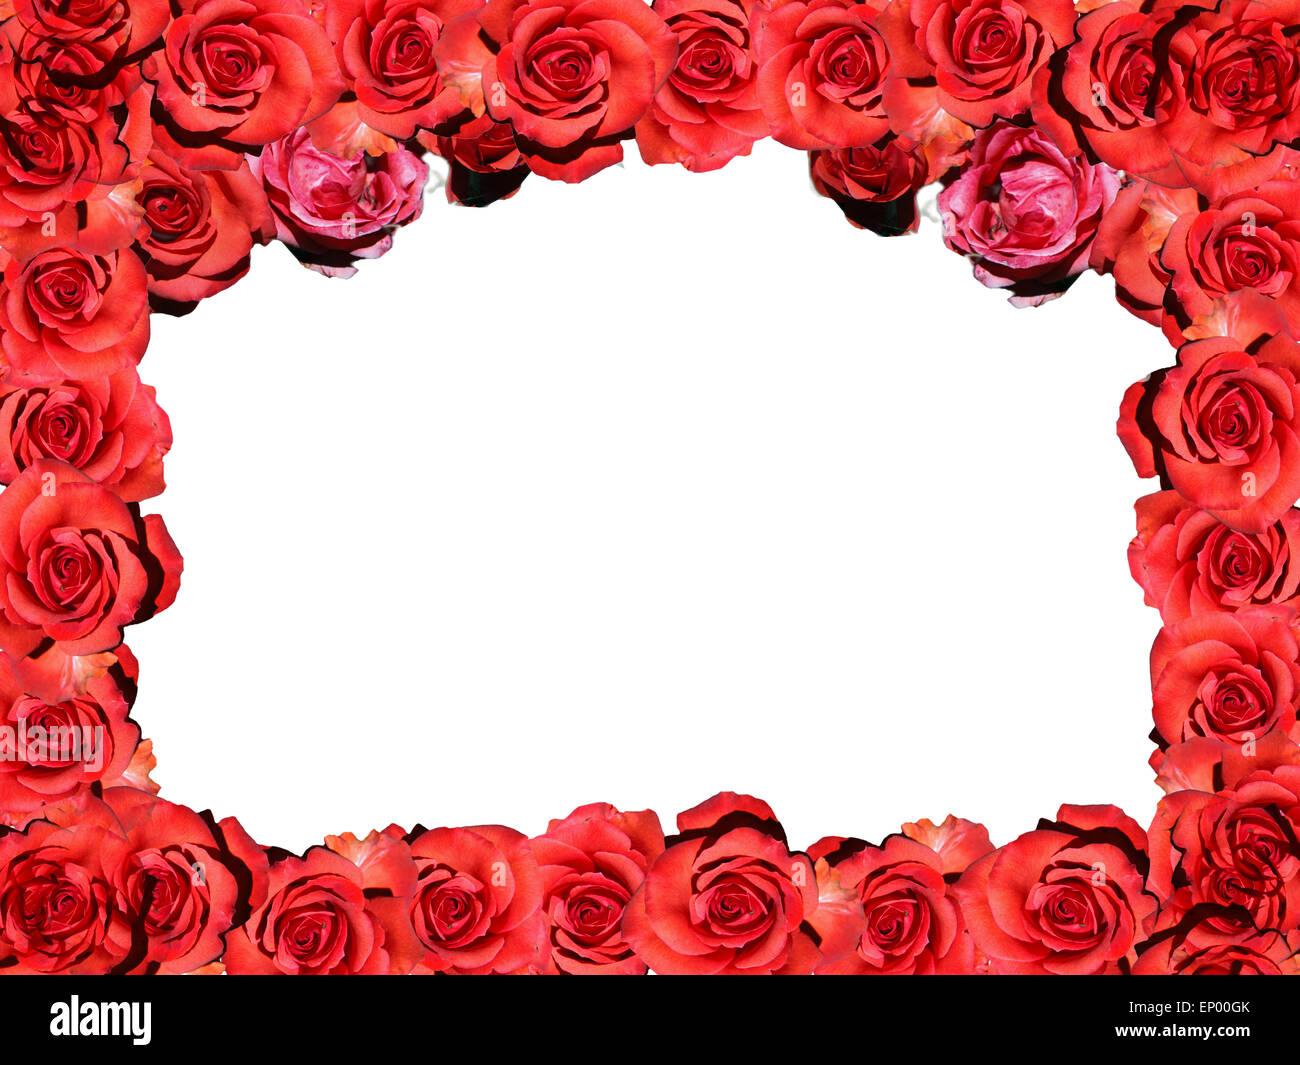 Rahmen: Rote Rosen - Symbolbild Liebe/ Valentinstag/ frame: red rose ...